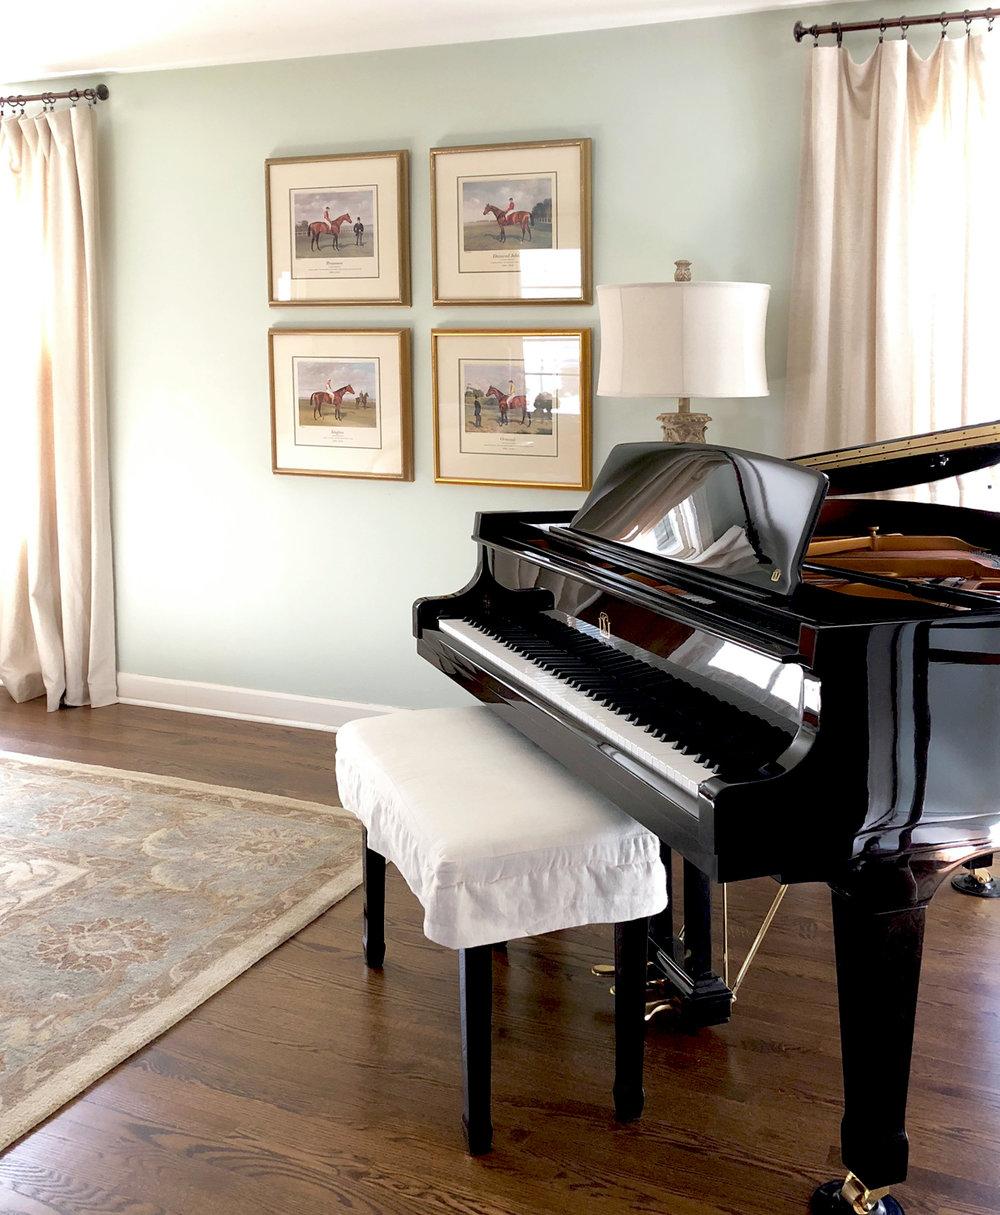 BedroomWallArt&Piano.jpg